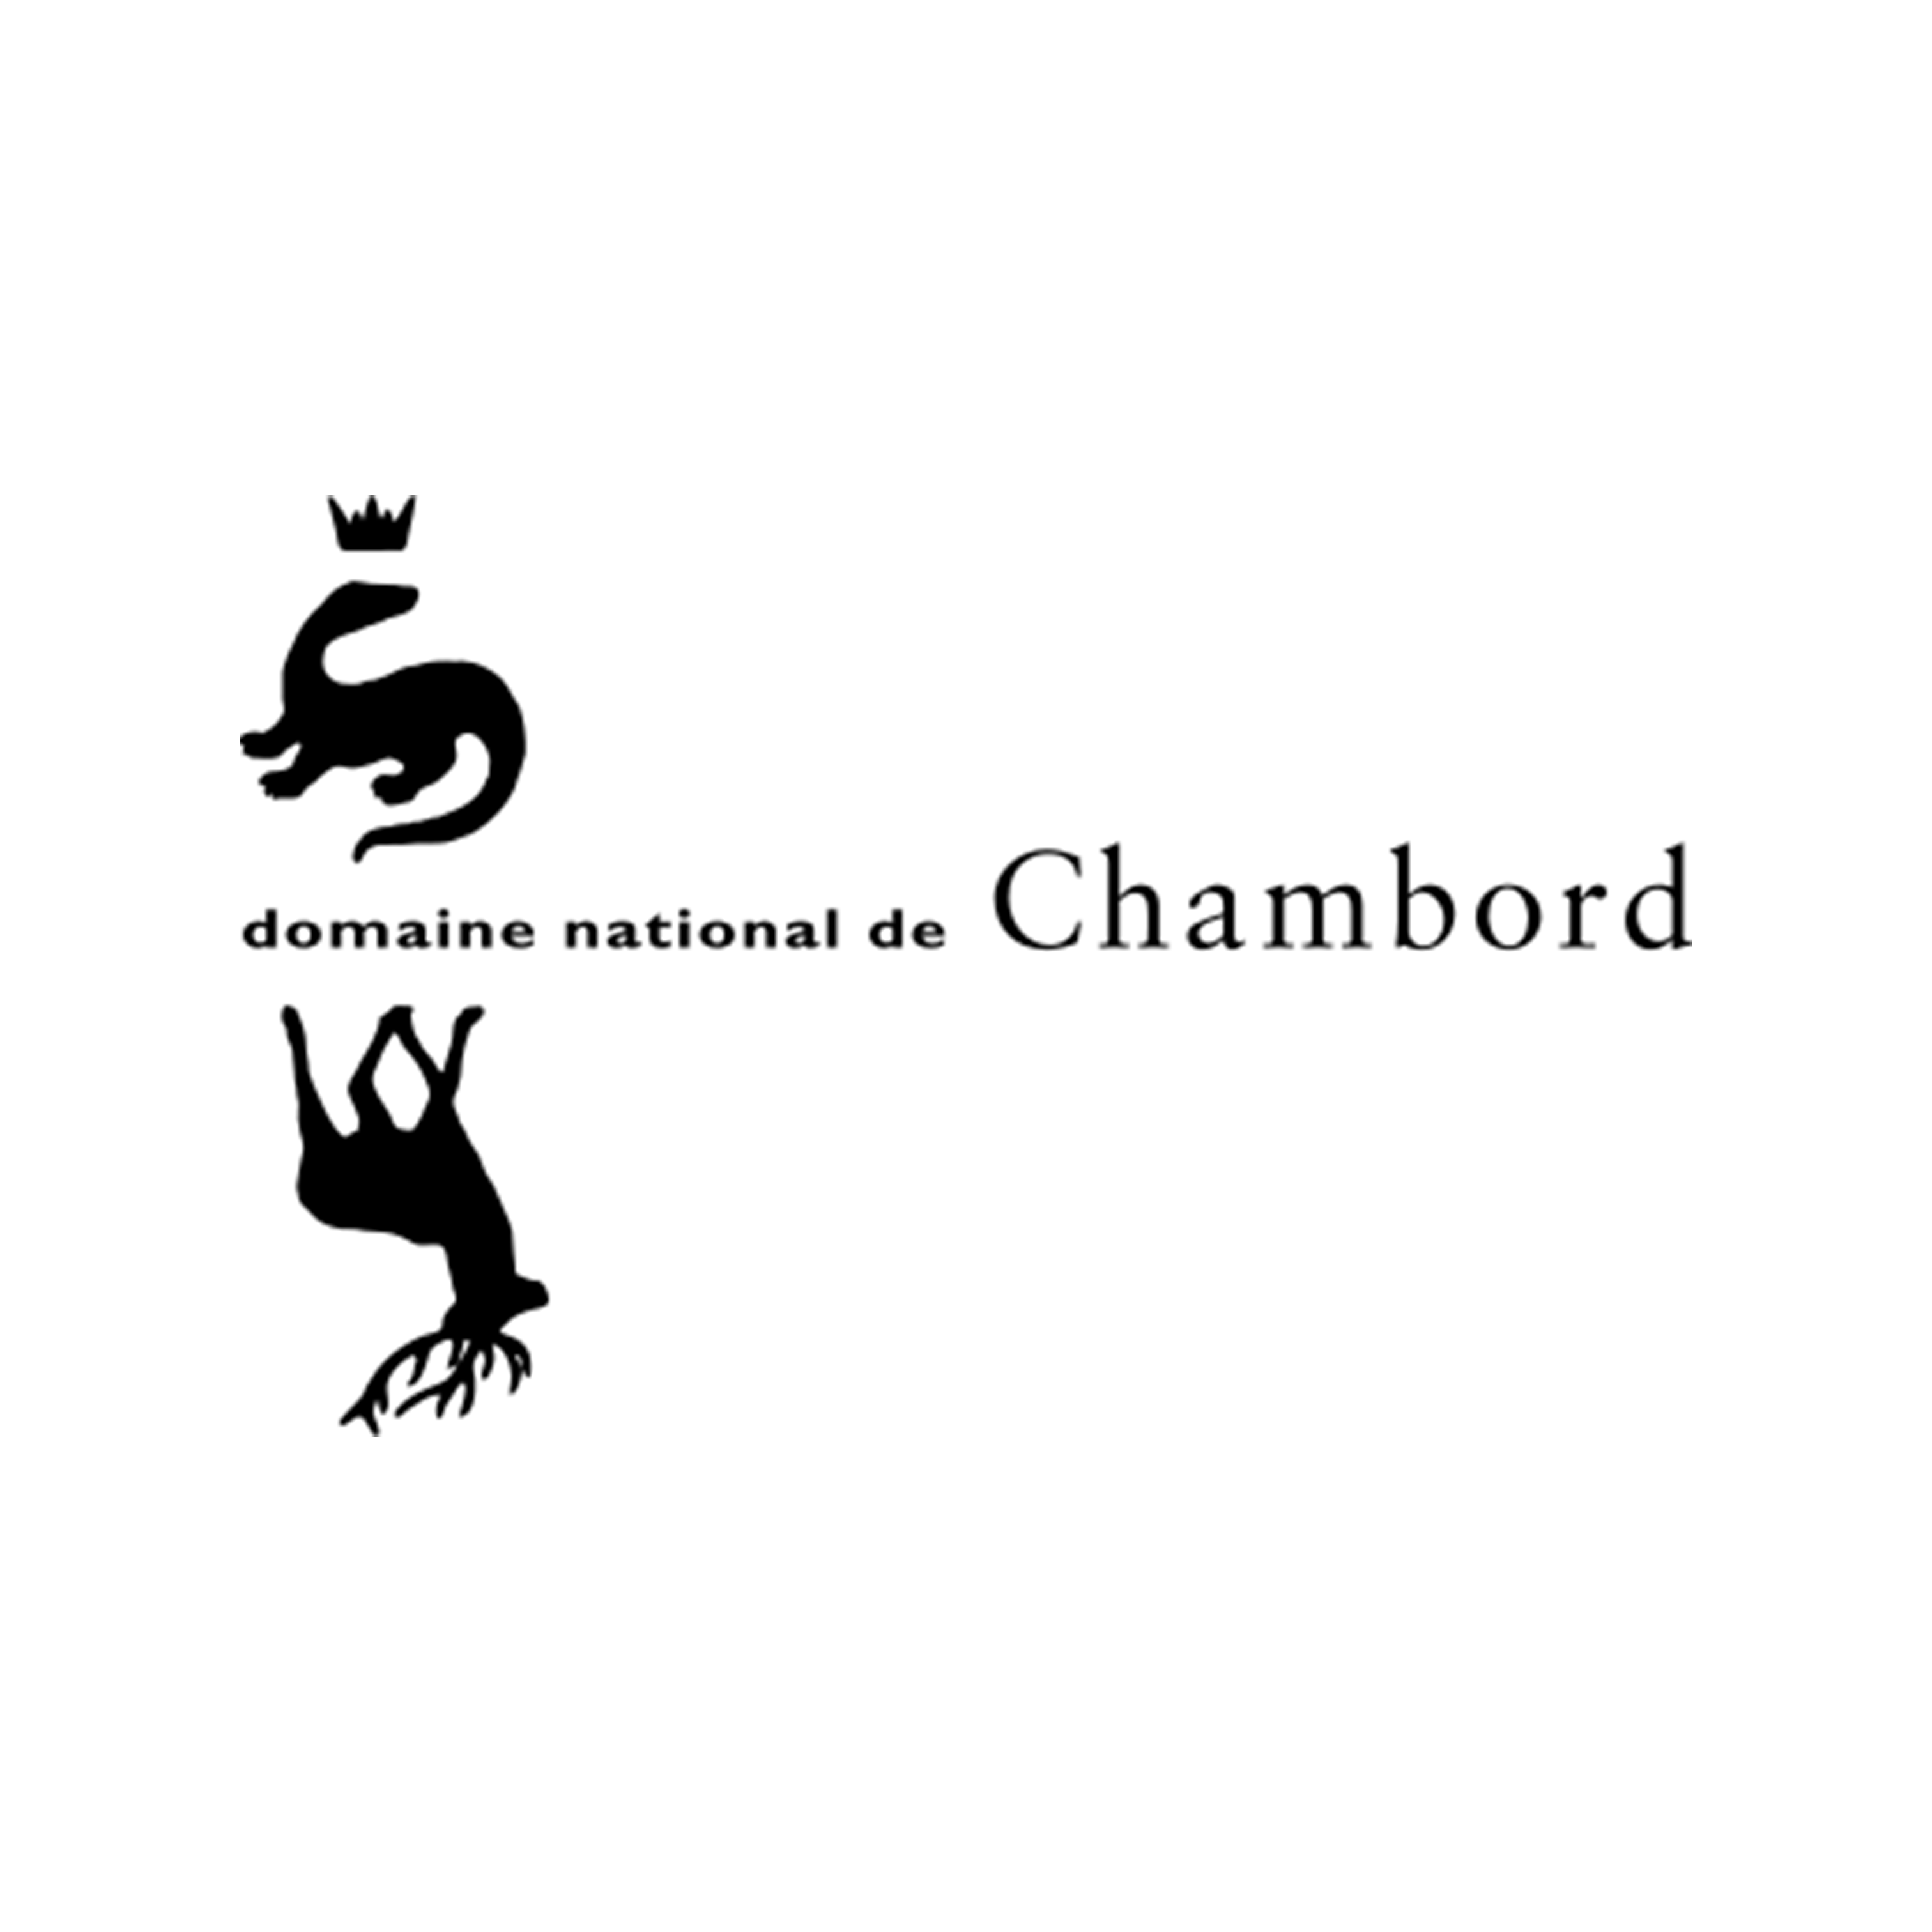 domaine-de-chambord-logo